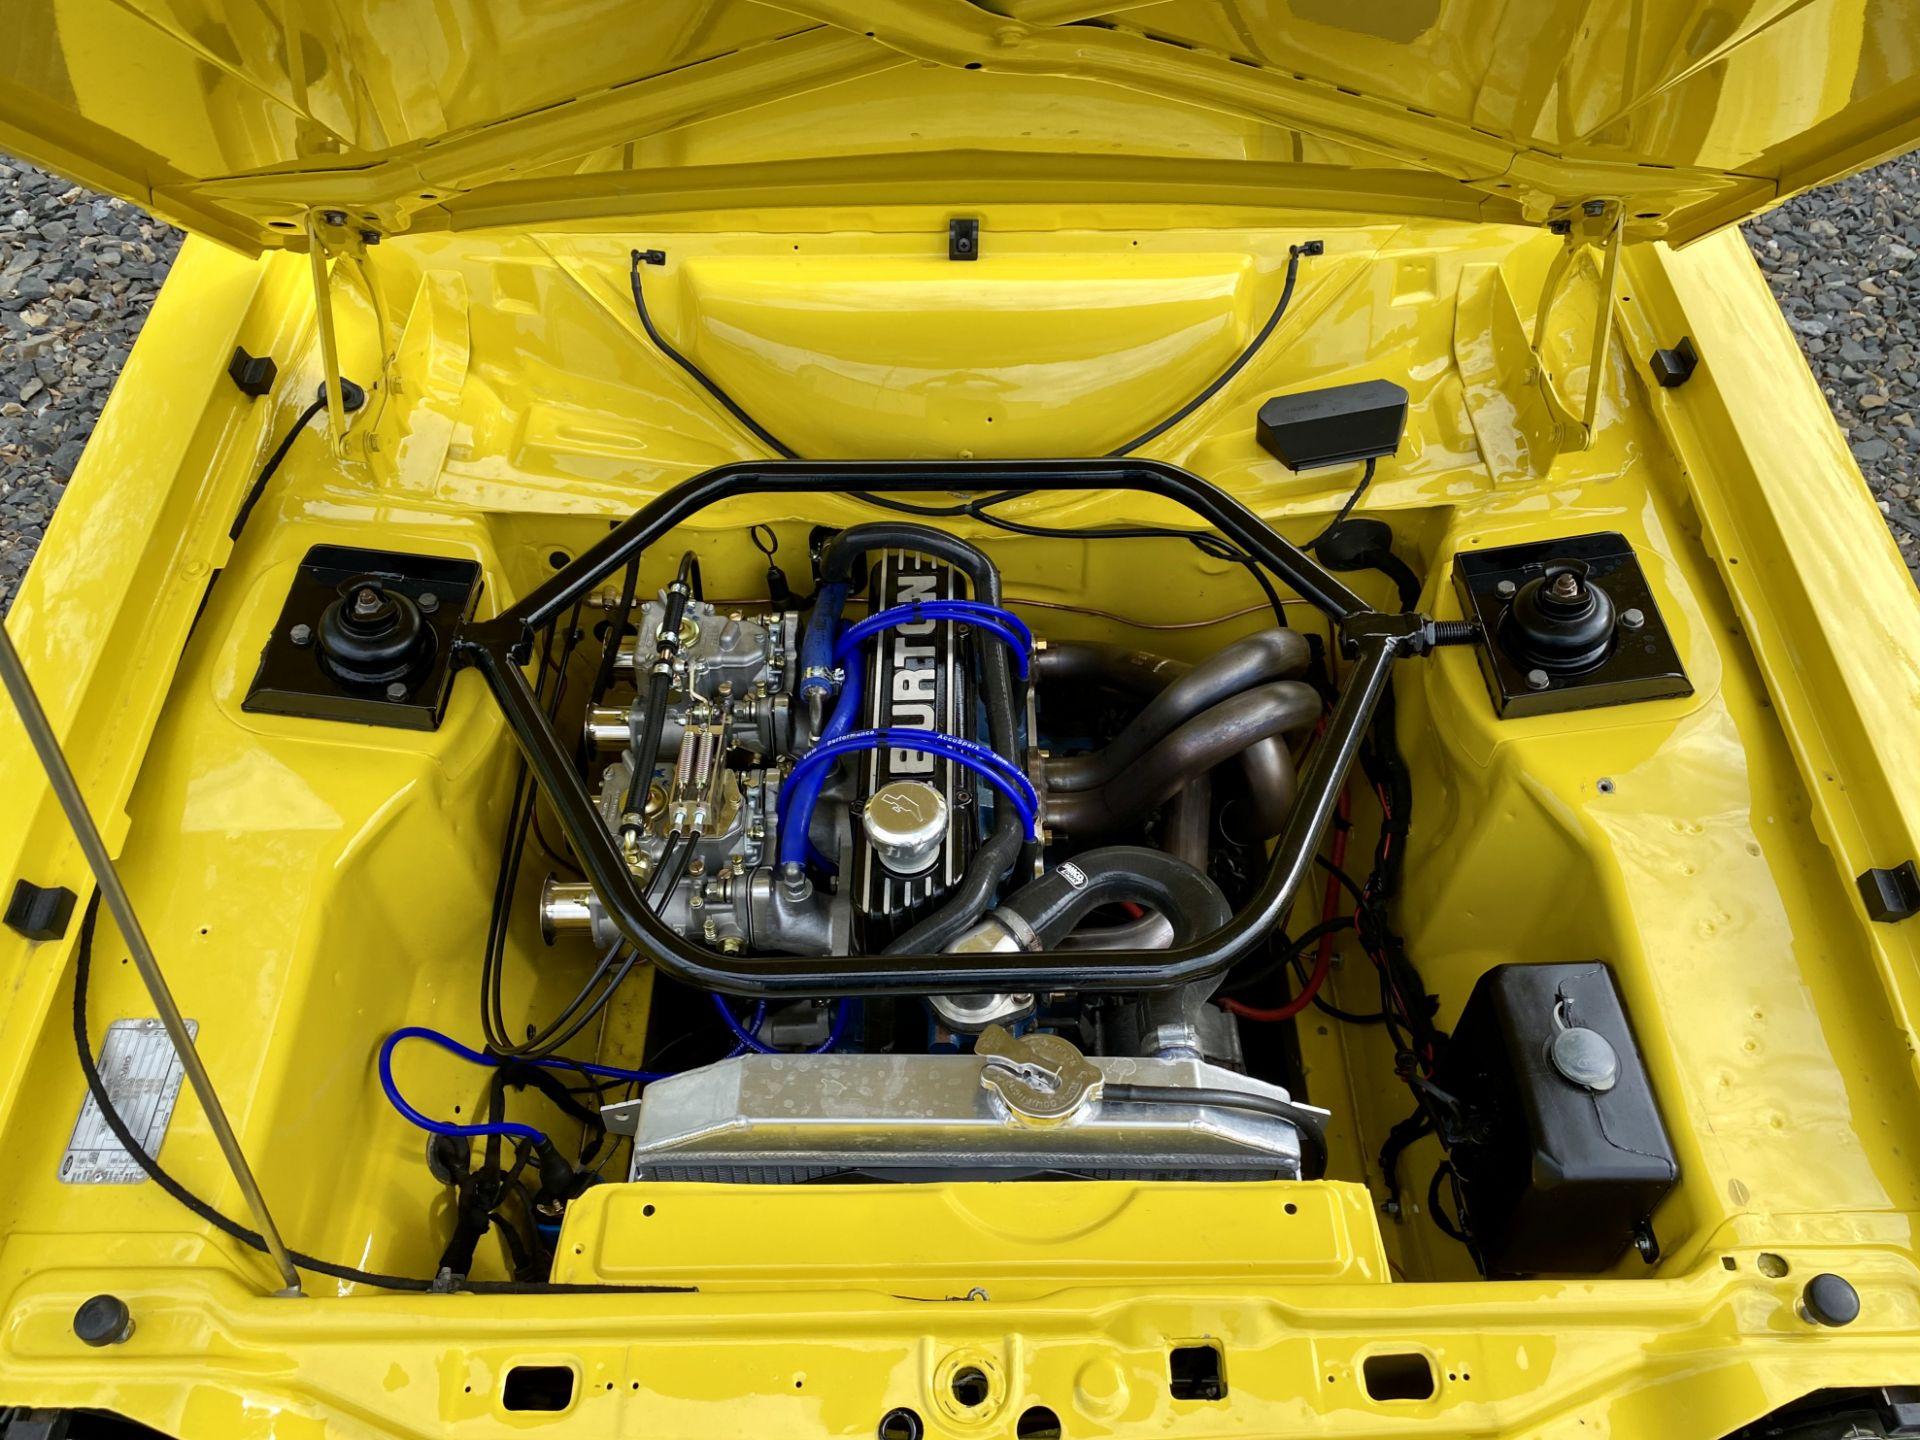 Ford Escort MK2 - Image 55 of 58